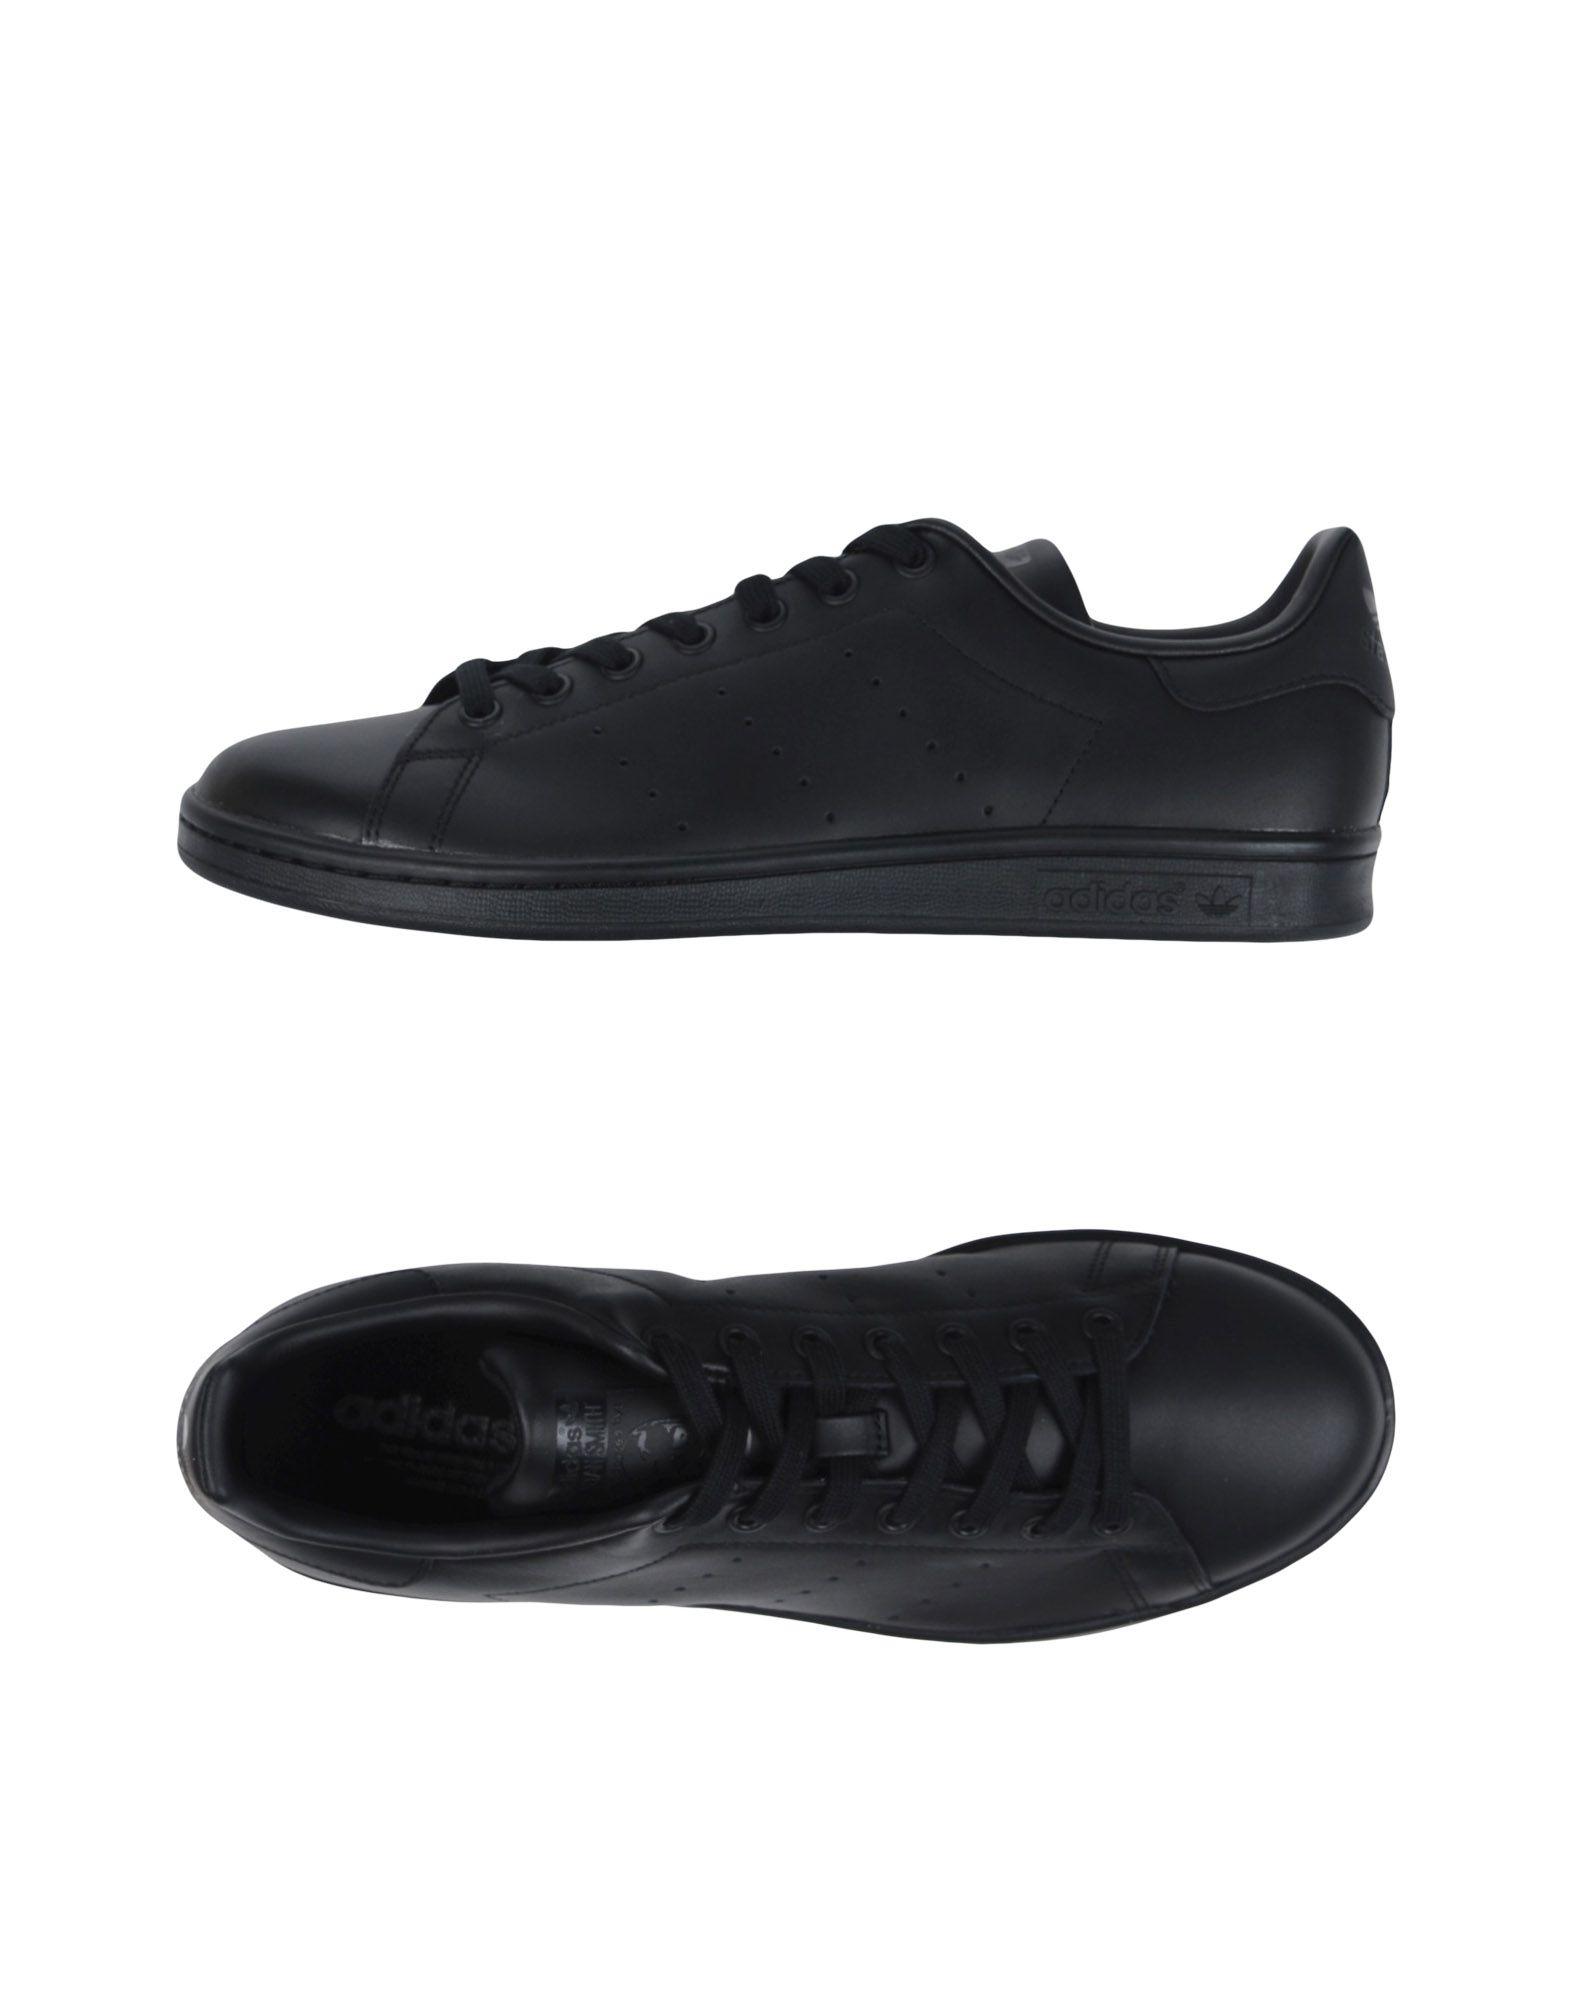 Adidas Originals Adidas Stansmith - Uomo - 11200363NH